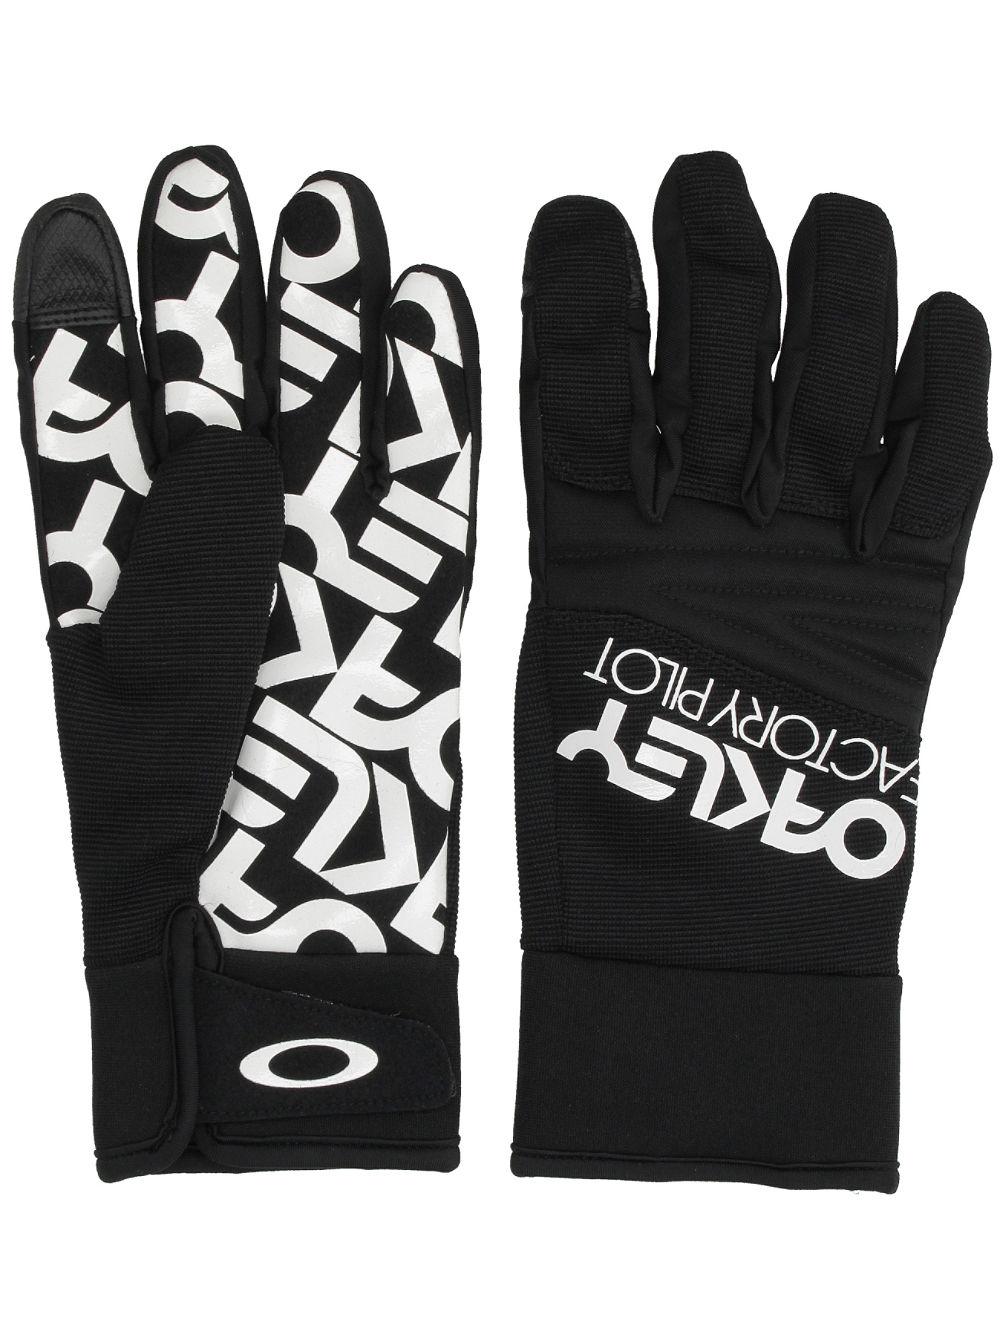 oakley-factory-park-gloves